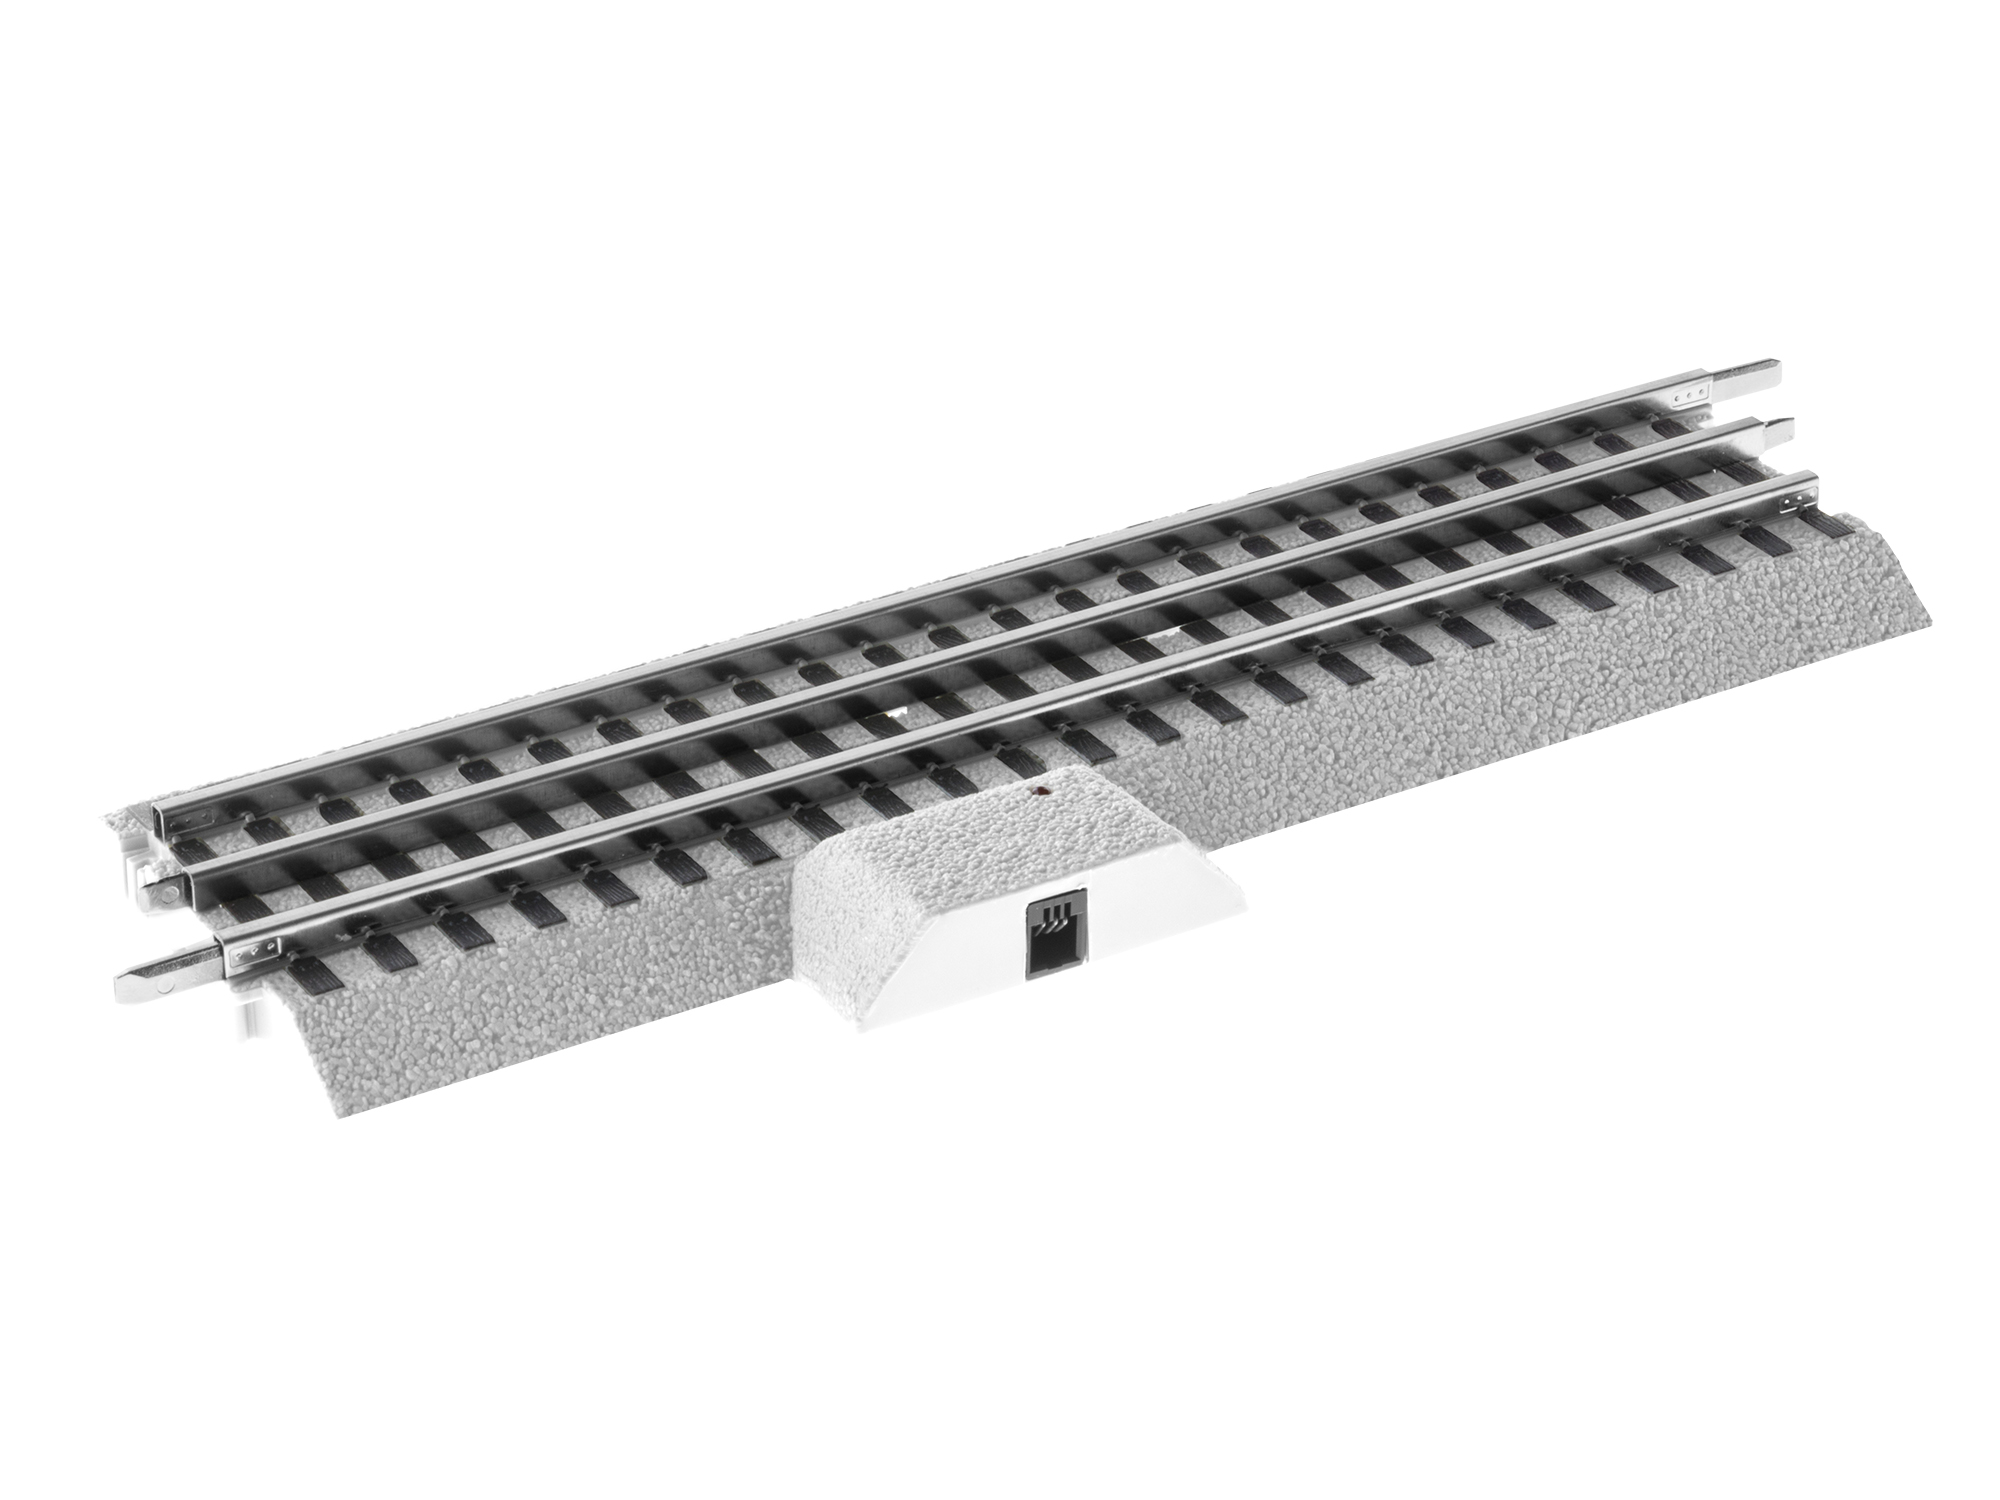 Lionel 685391 O PEP Activation Track FasTrack Ballast